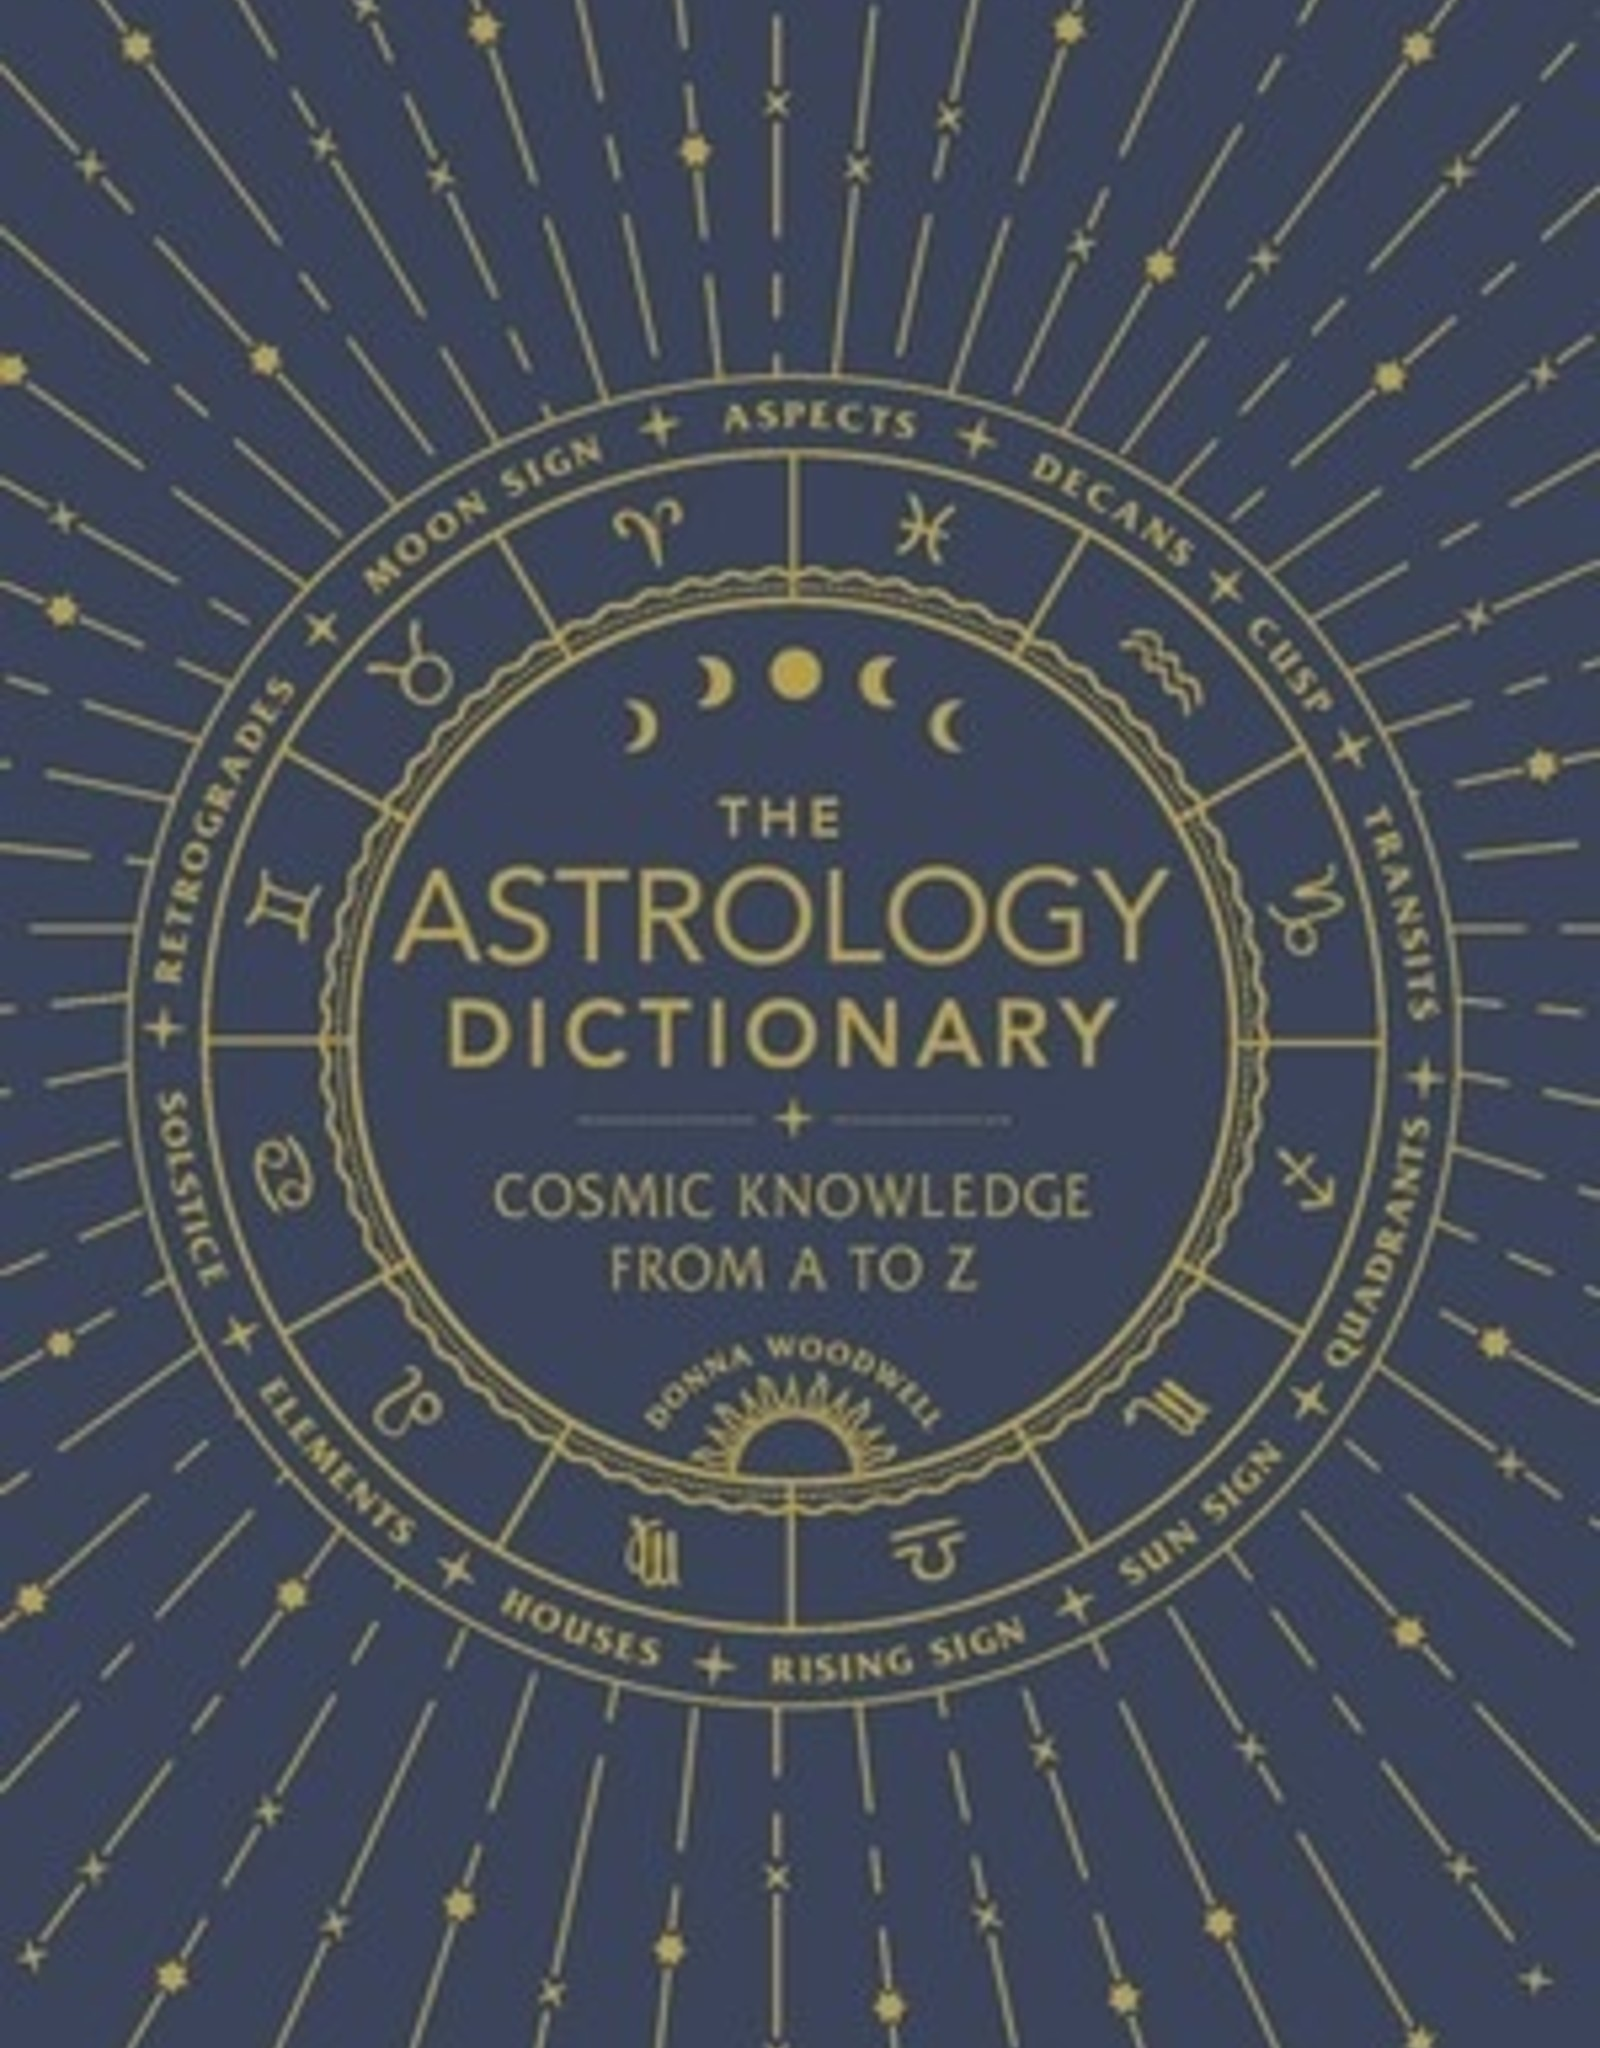 Simon & Schuster *Astrology Dictionary